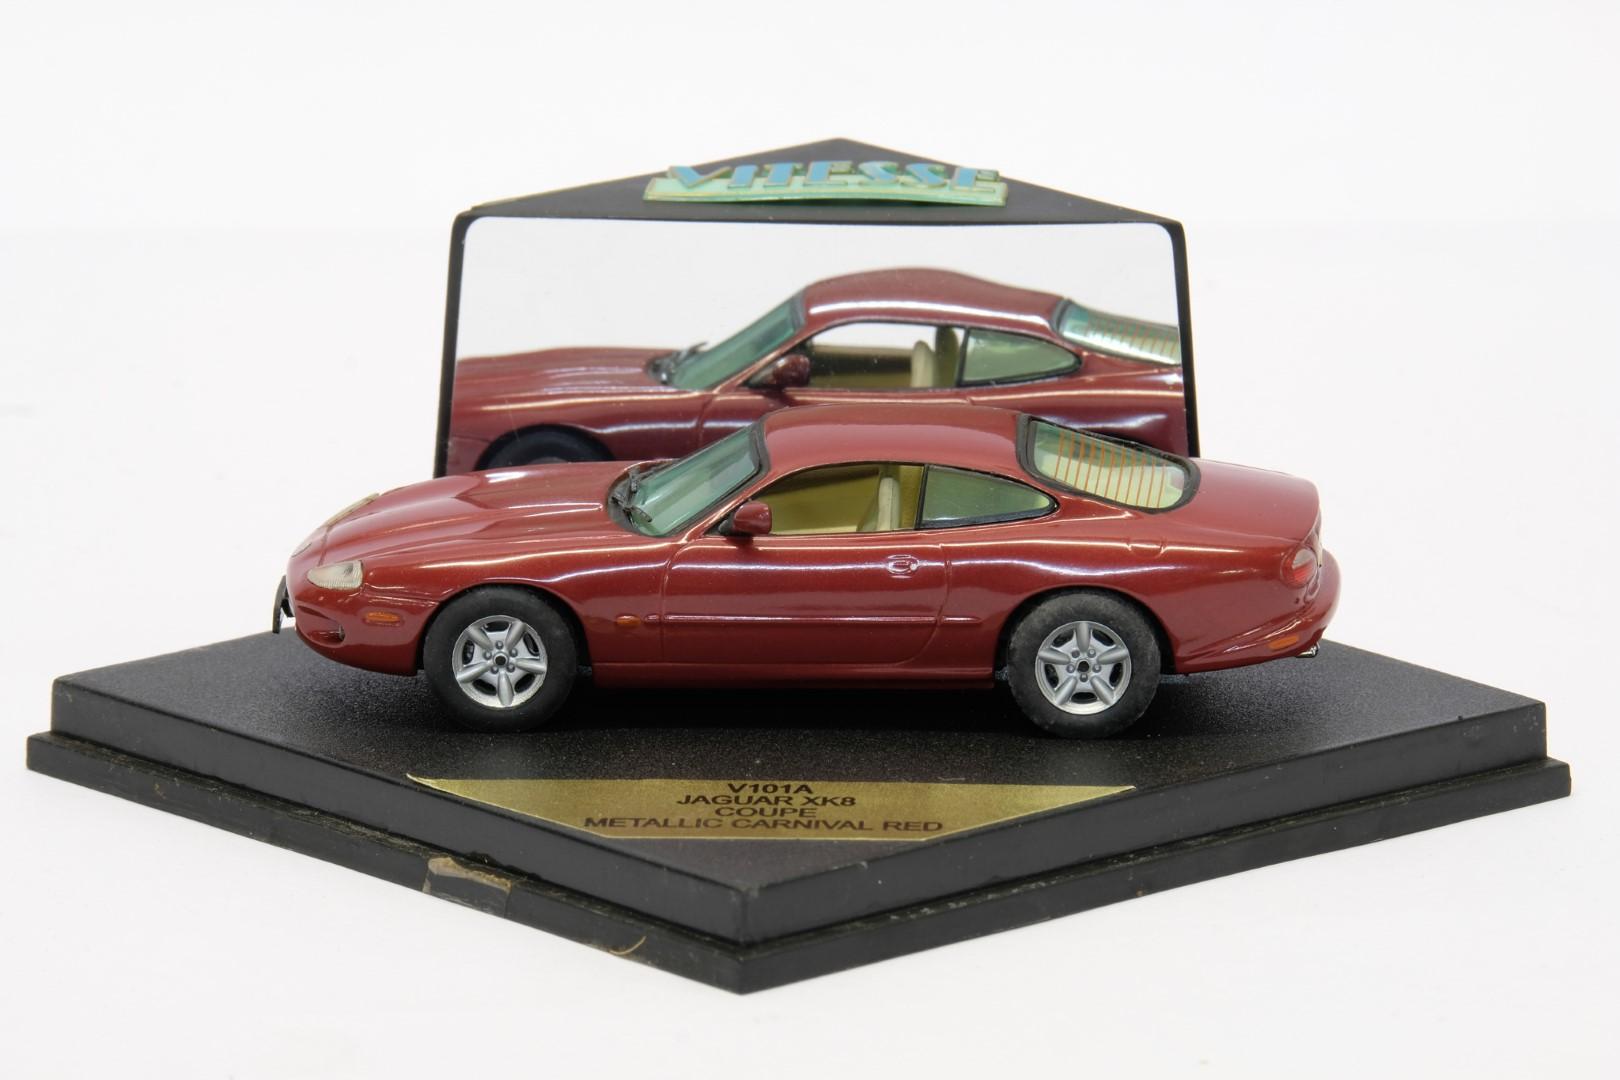 Vitesse 2 Jaguar XK8 Models - Image 3 of 3